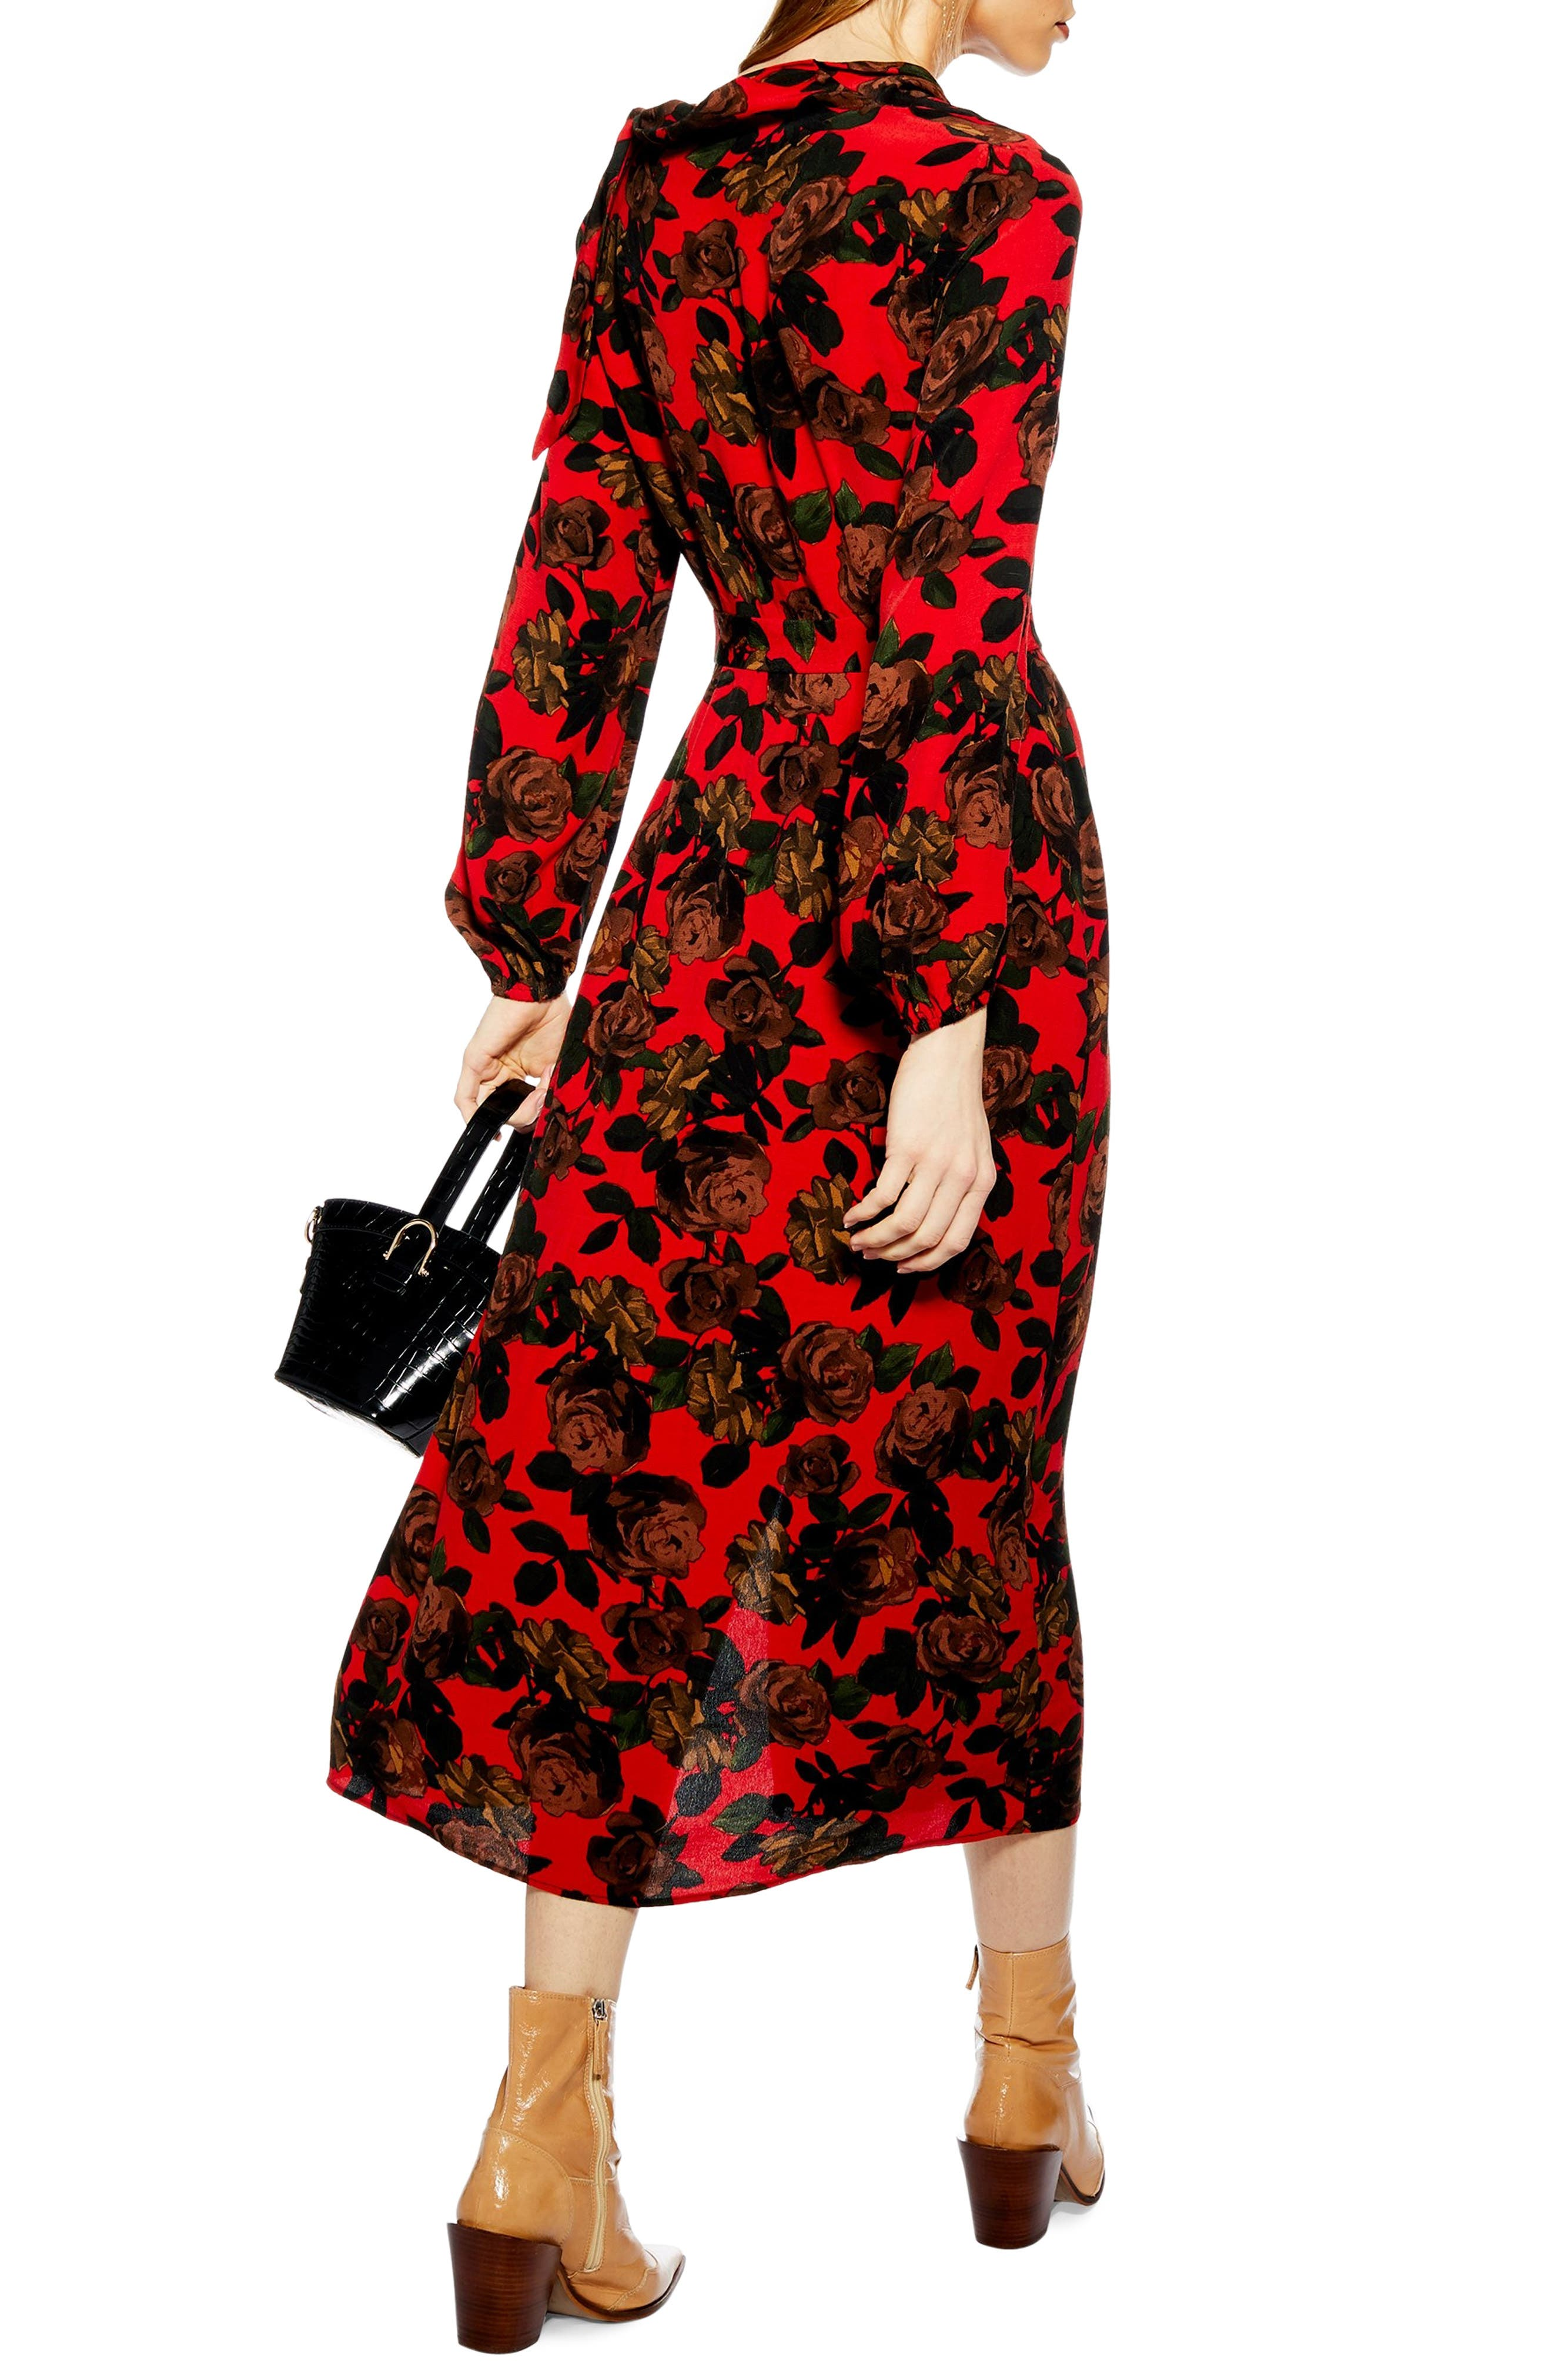 TOPSHOP,                             Rose Cut Tie Neck Midi Dress,                             Alternate thumbnail 2, color,                             RED MULTI